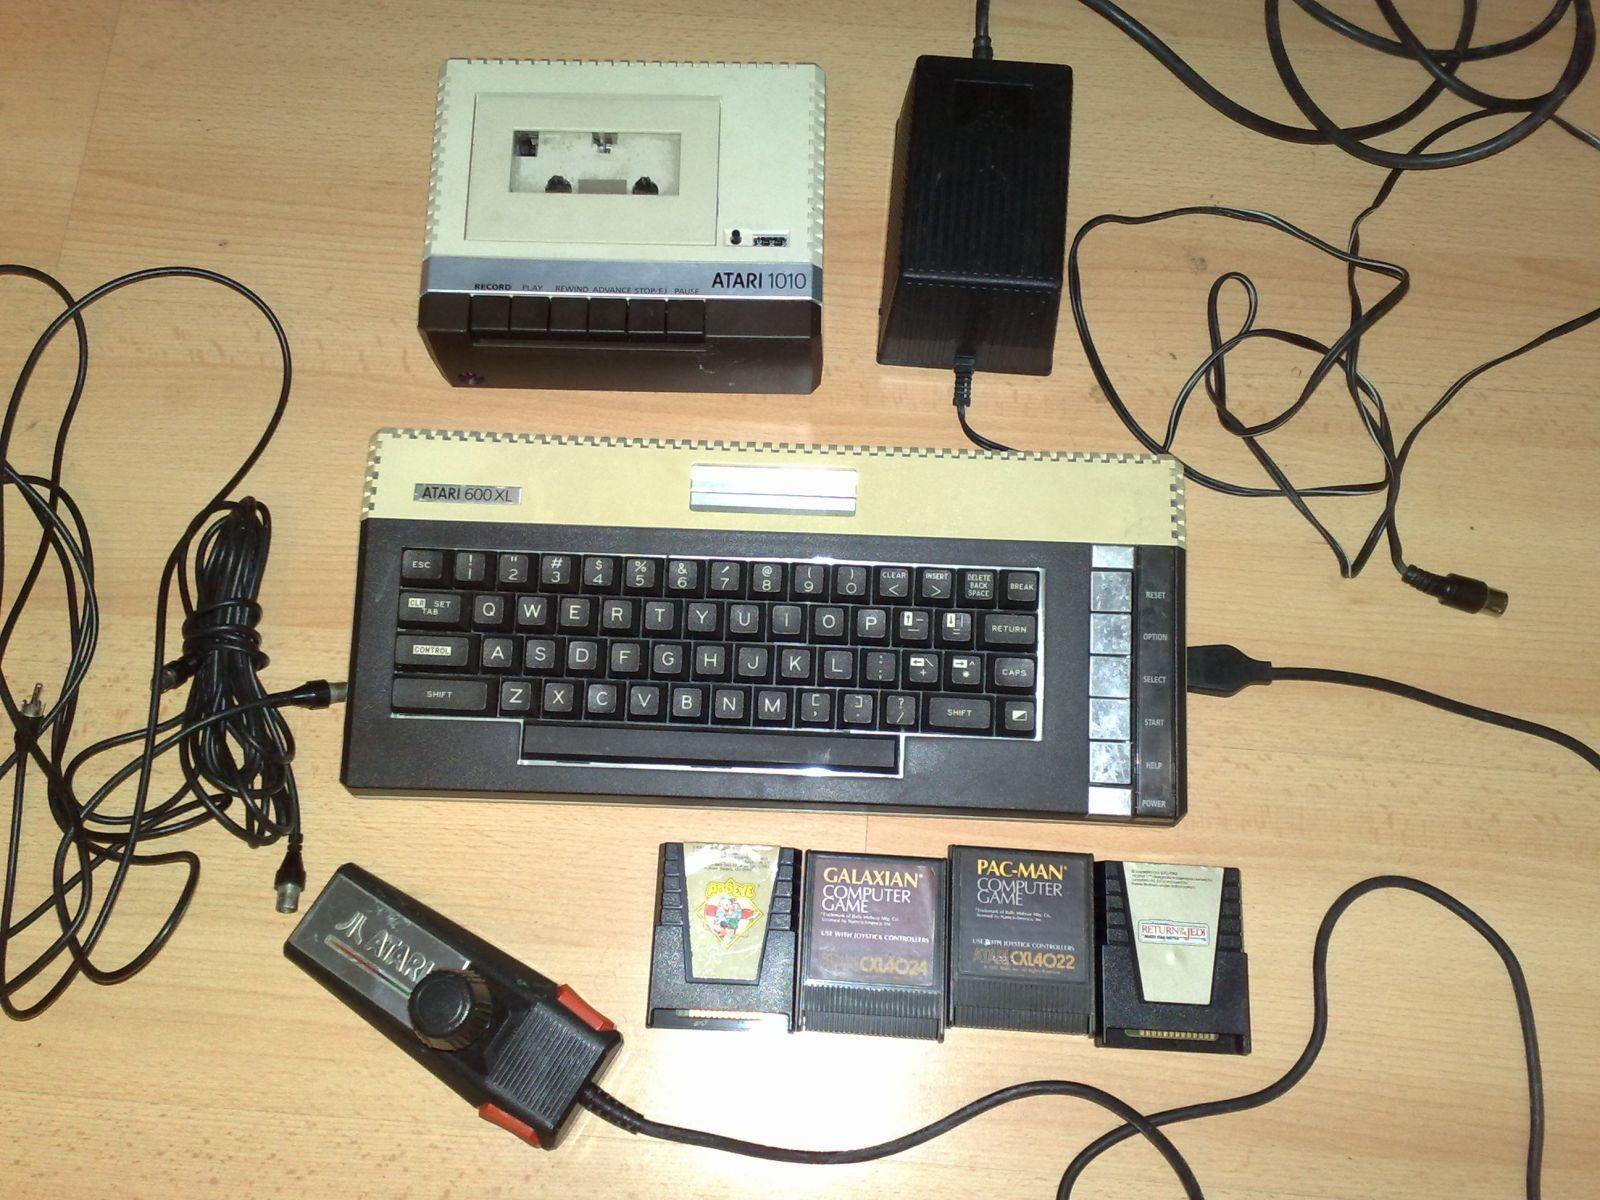 Atari 600XL ir Atari 1010